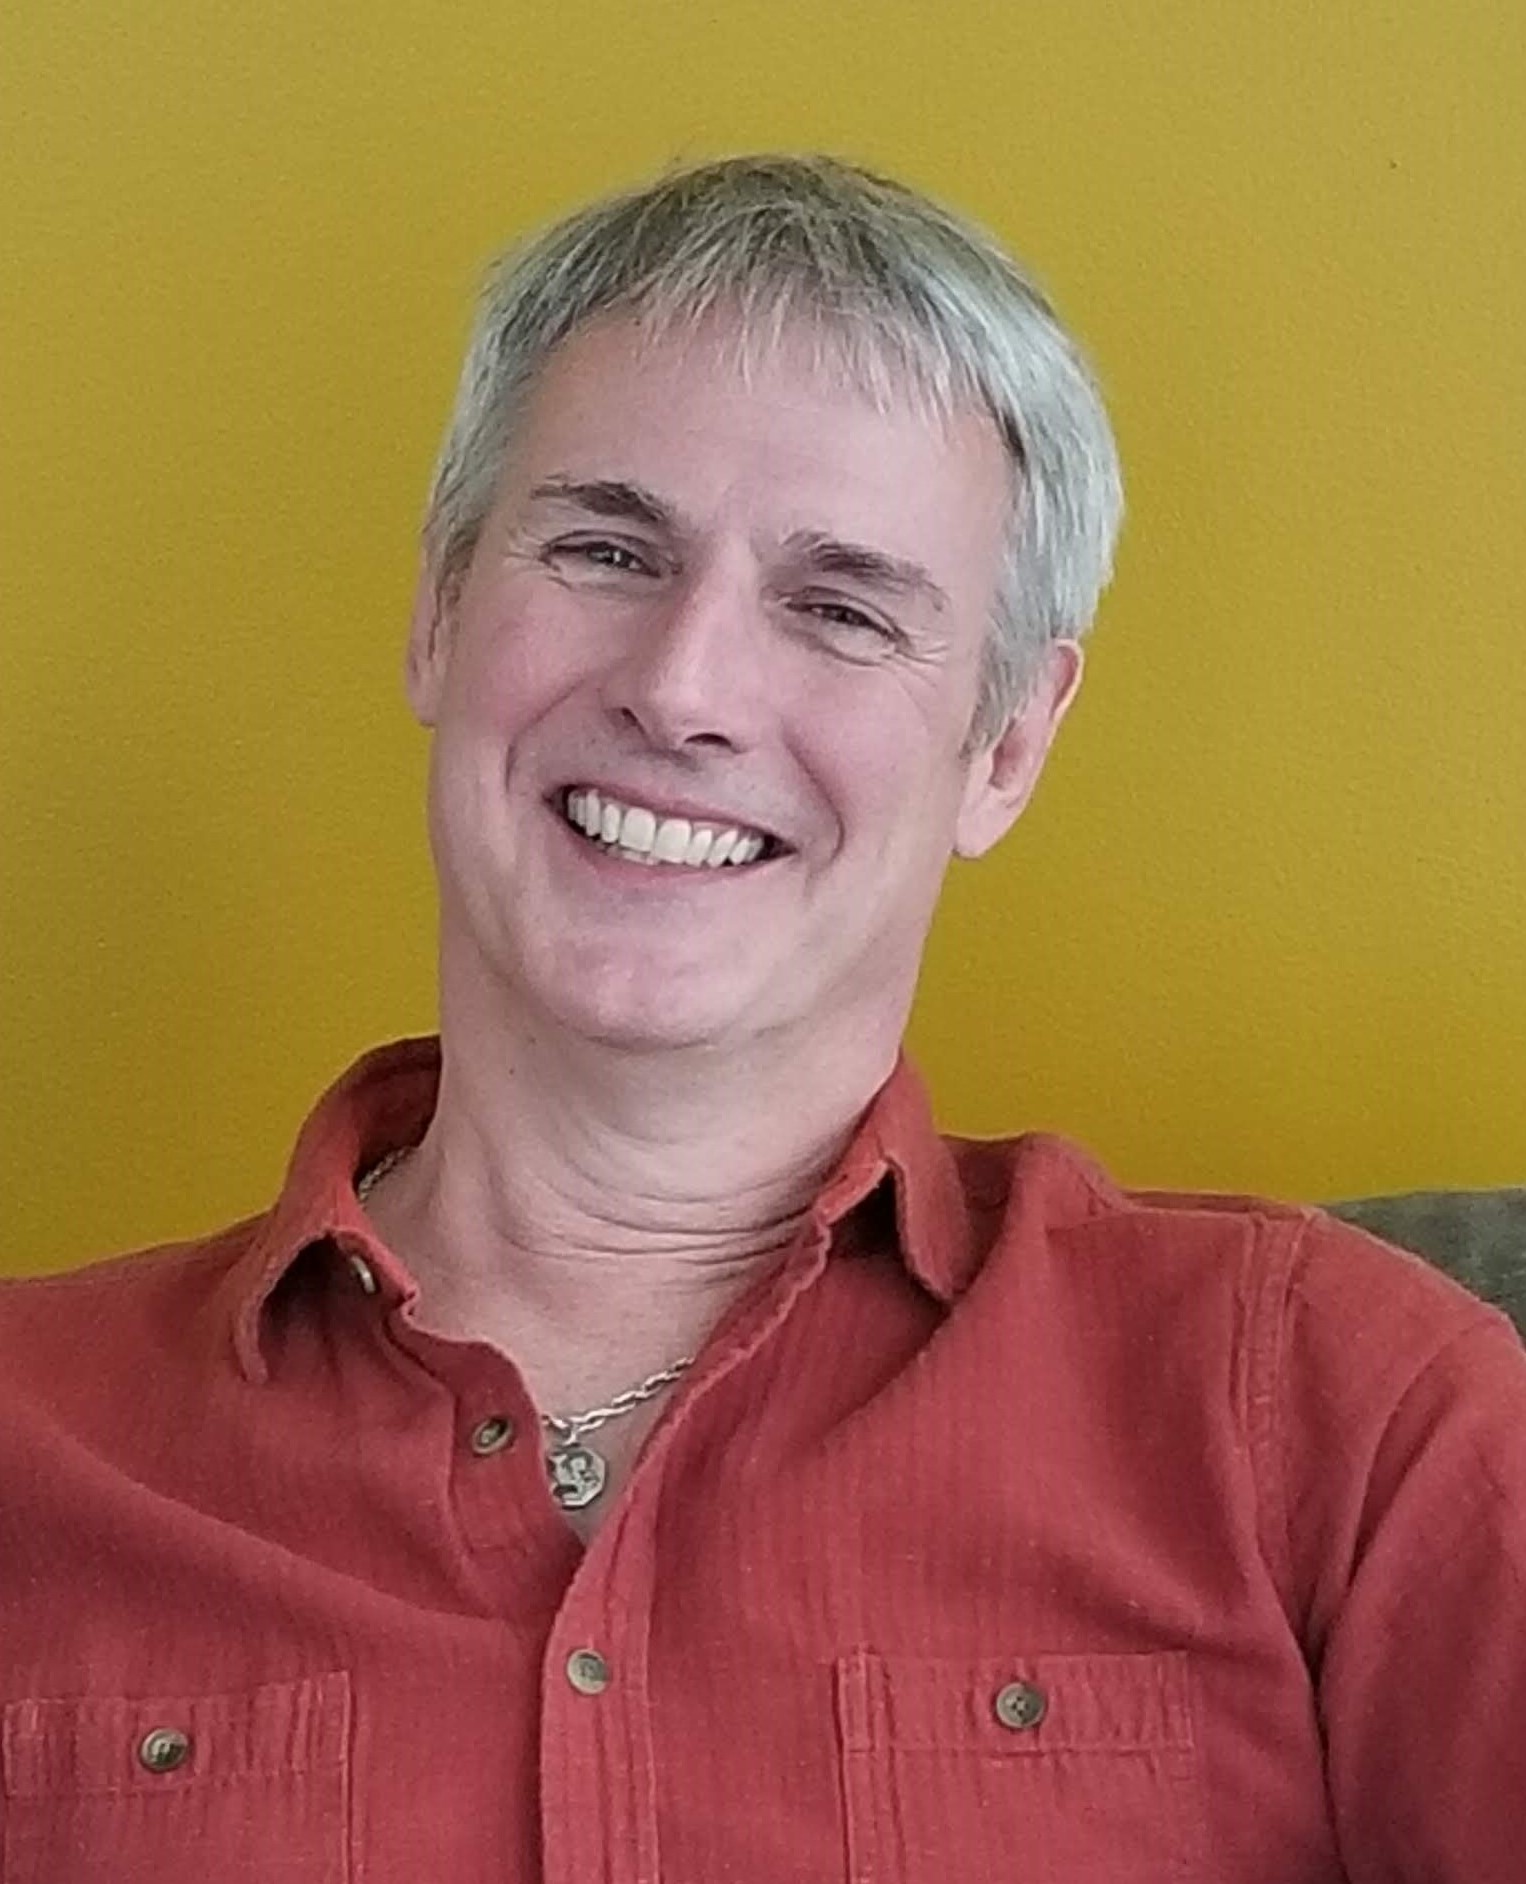 Stephen Beaumont